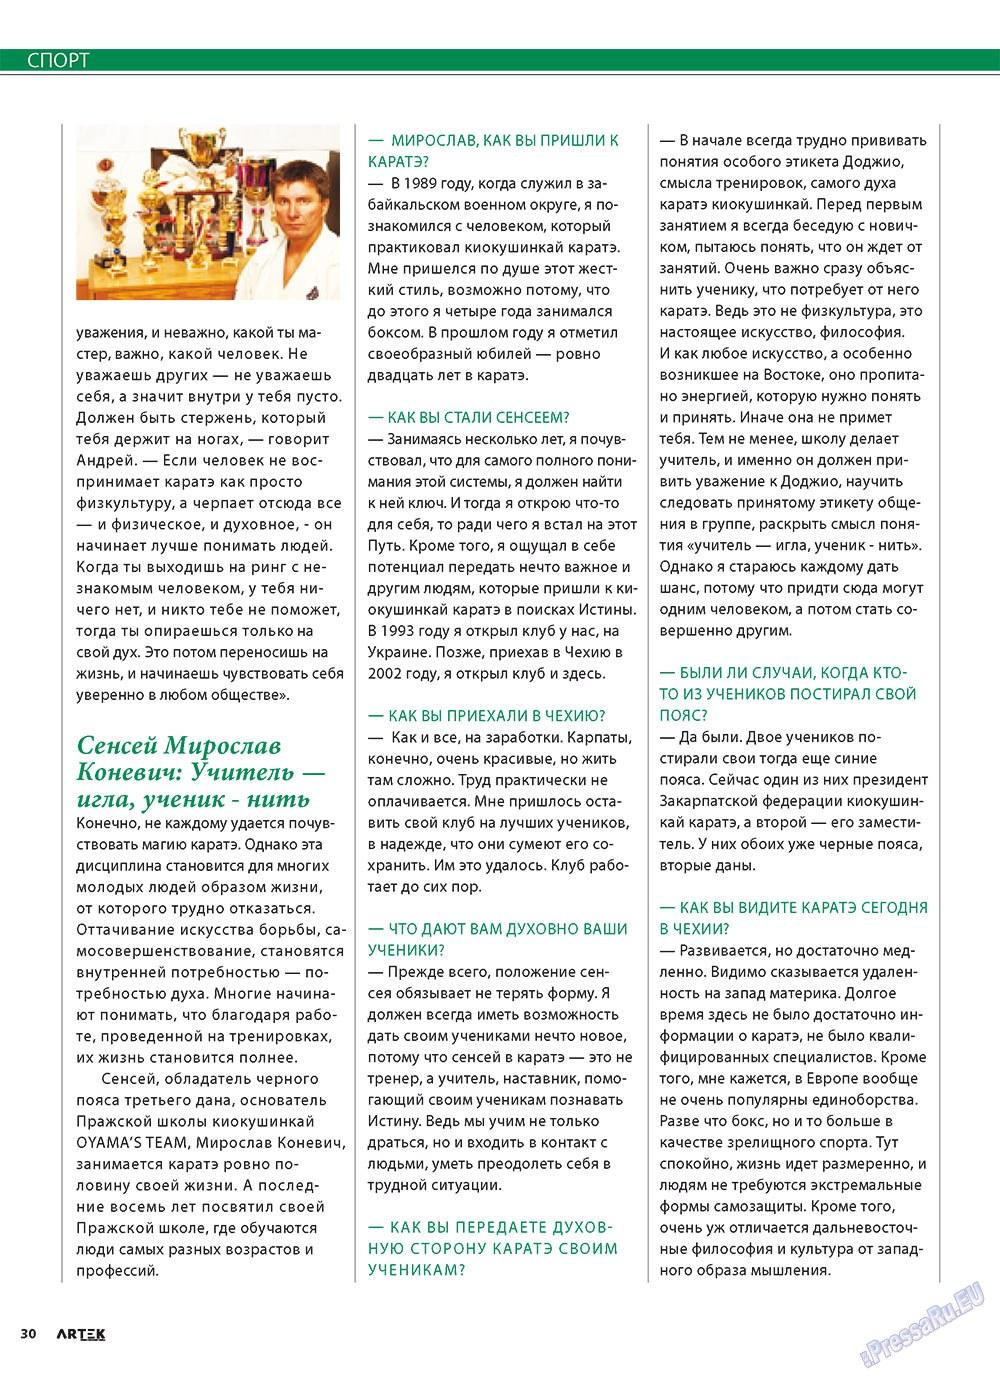 Артек (журнал). 2010 год, номер 5, стр. 32